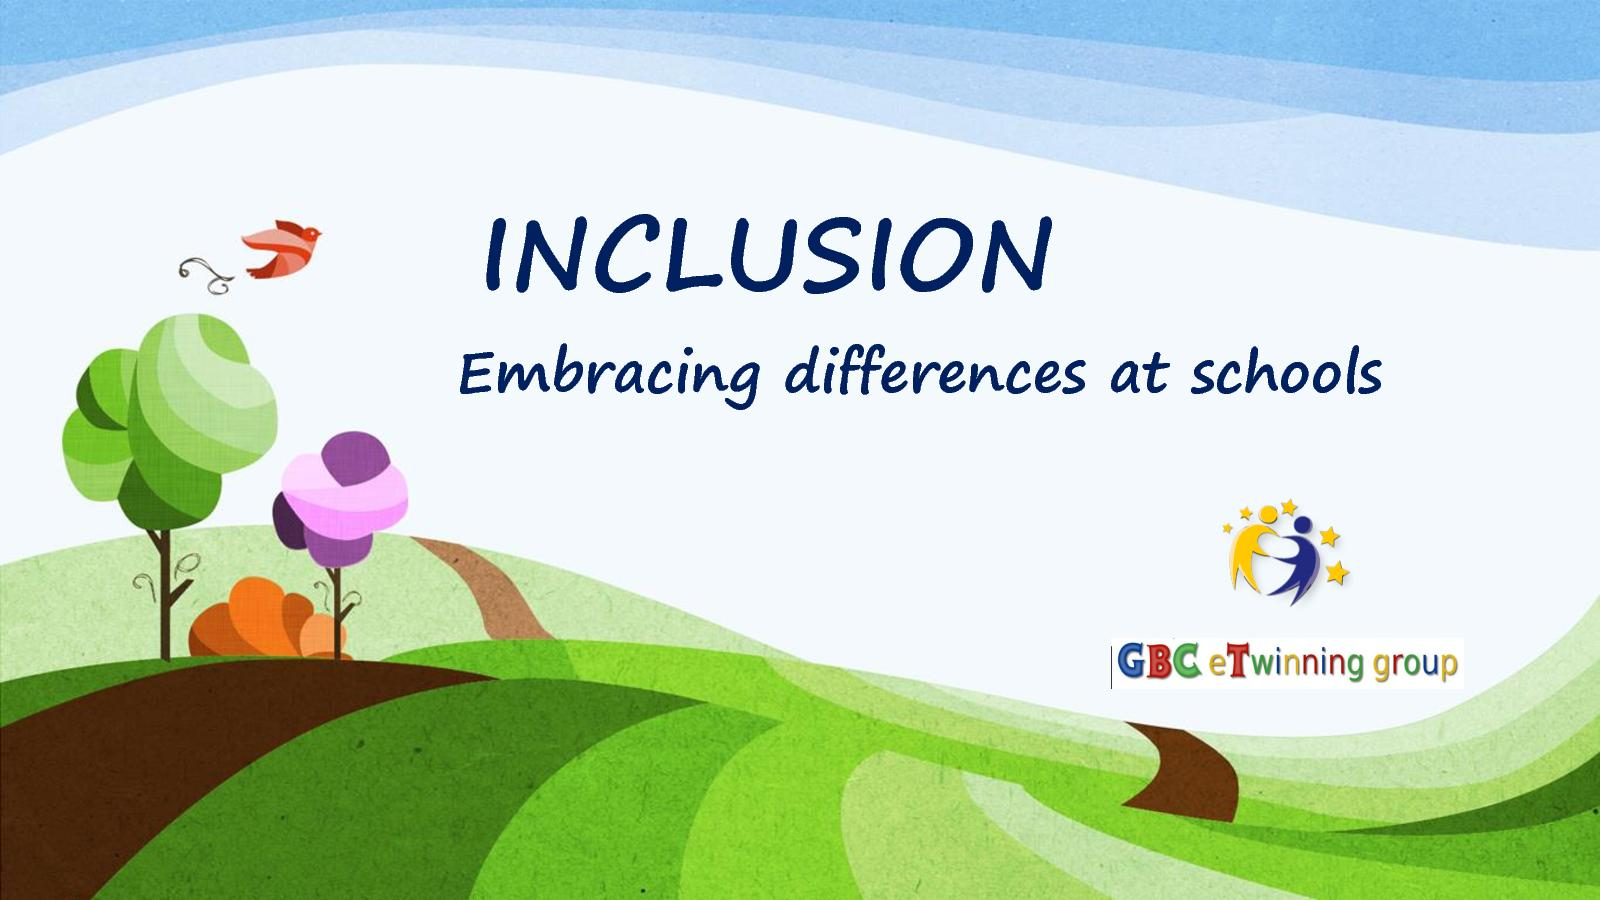 Inclusion Gbc Group